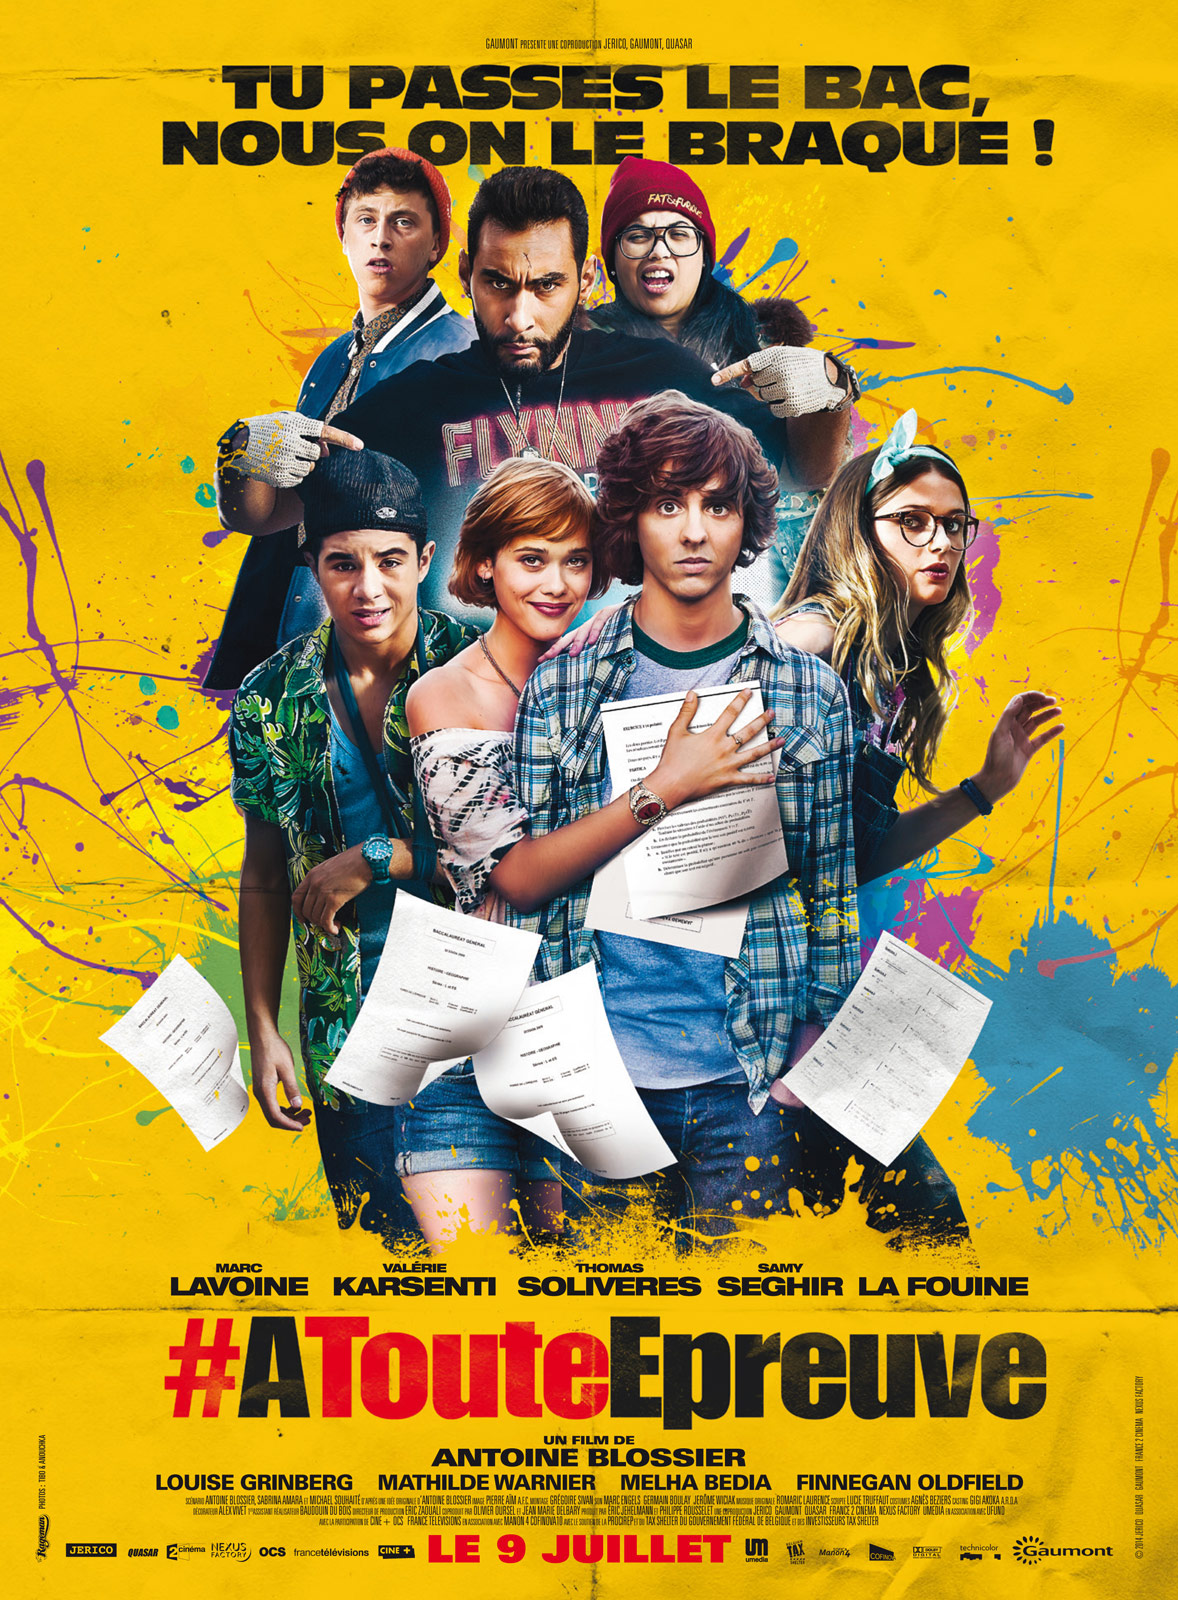 A toute Epreuve - 09/07/2014